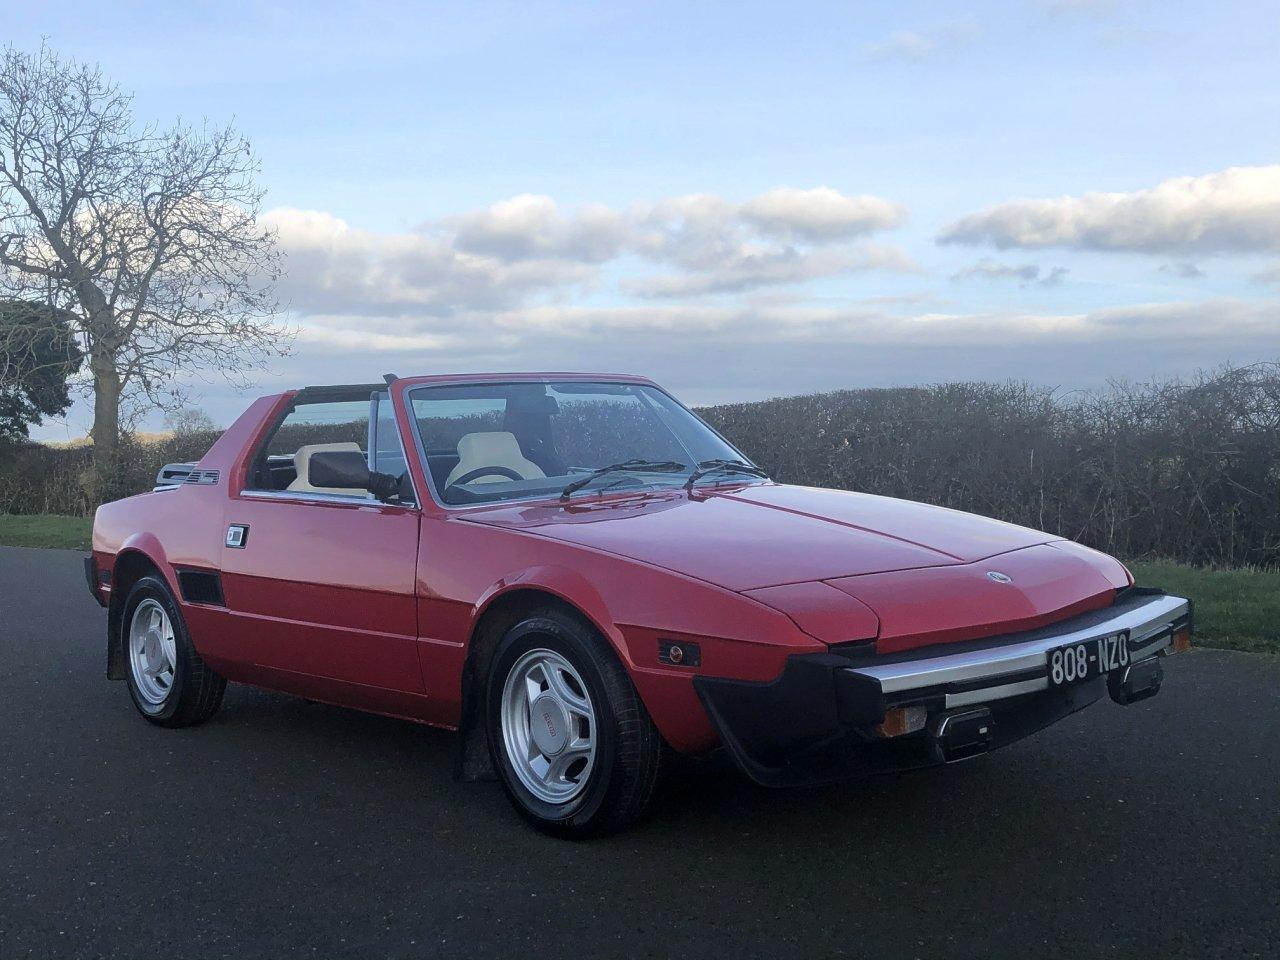 1981 Fiat X1/9 1500cc 5 Speed Targa SOLD (picture 3 of 6)